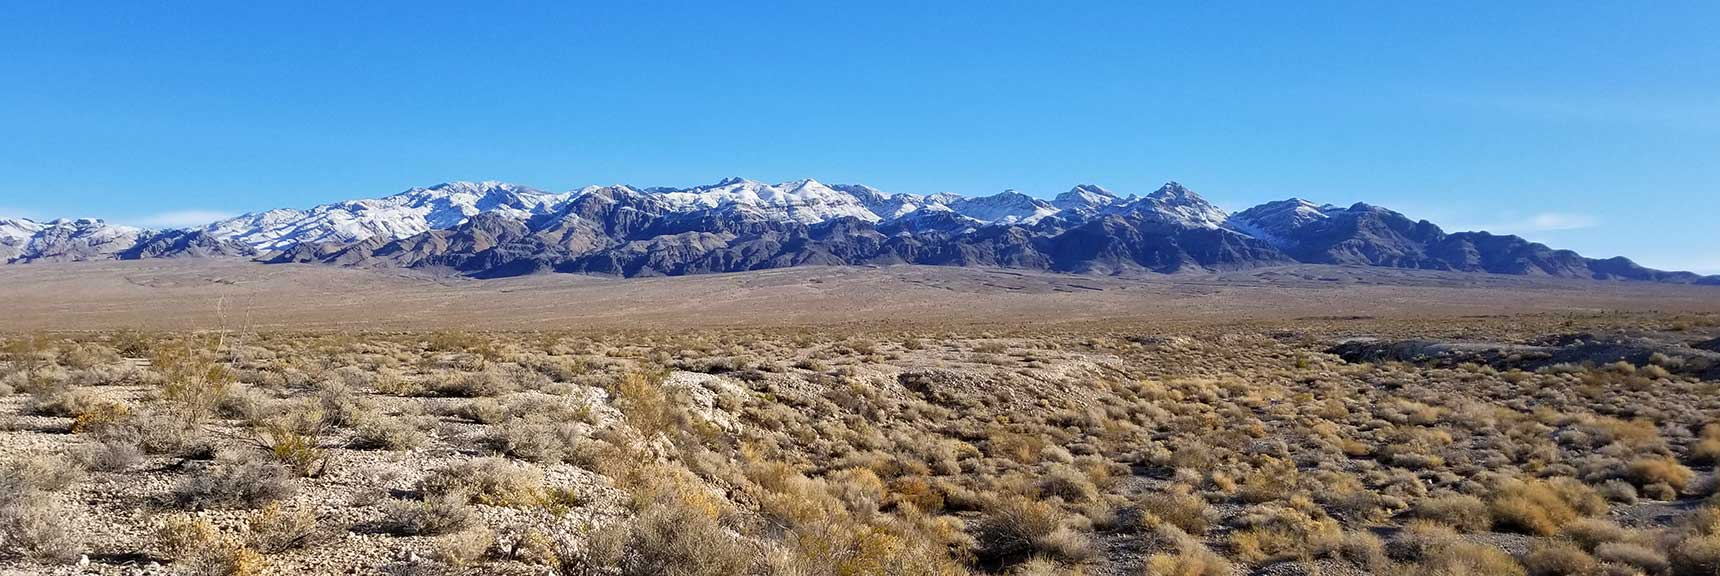 Sheep Range Viewed from The Desert National Wildlife Refuge Visitor Center, Nevada